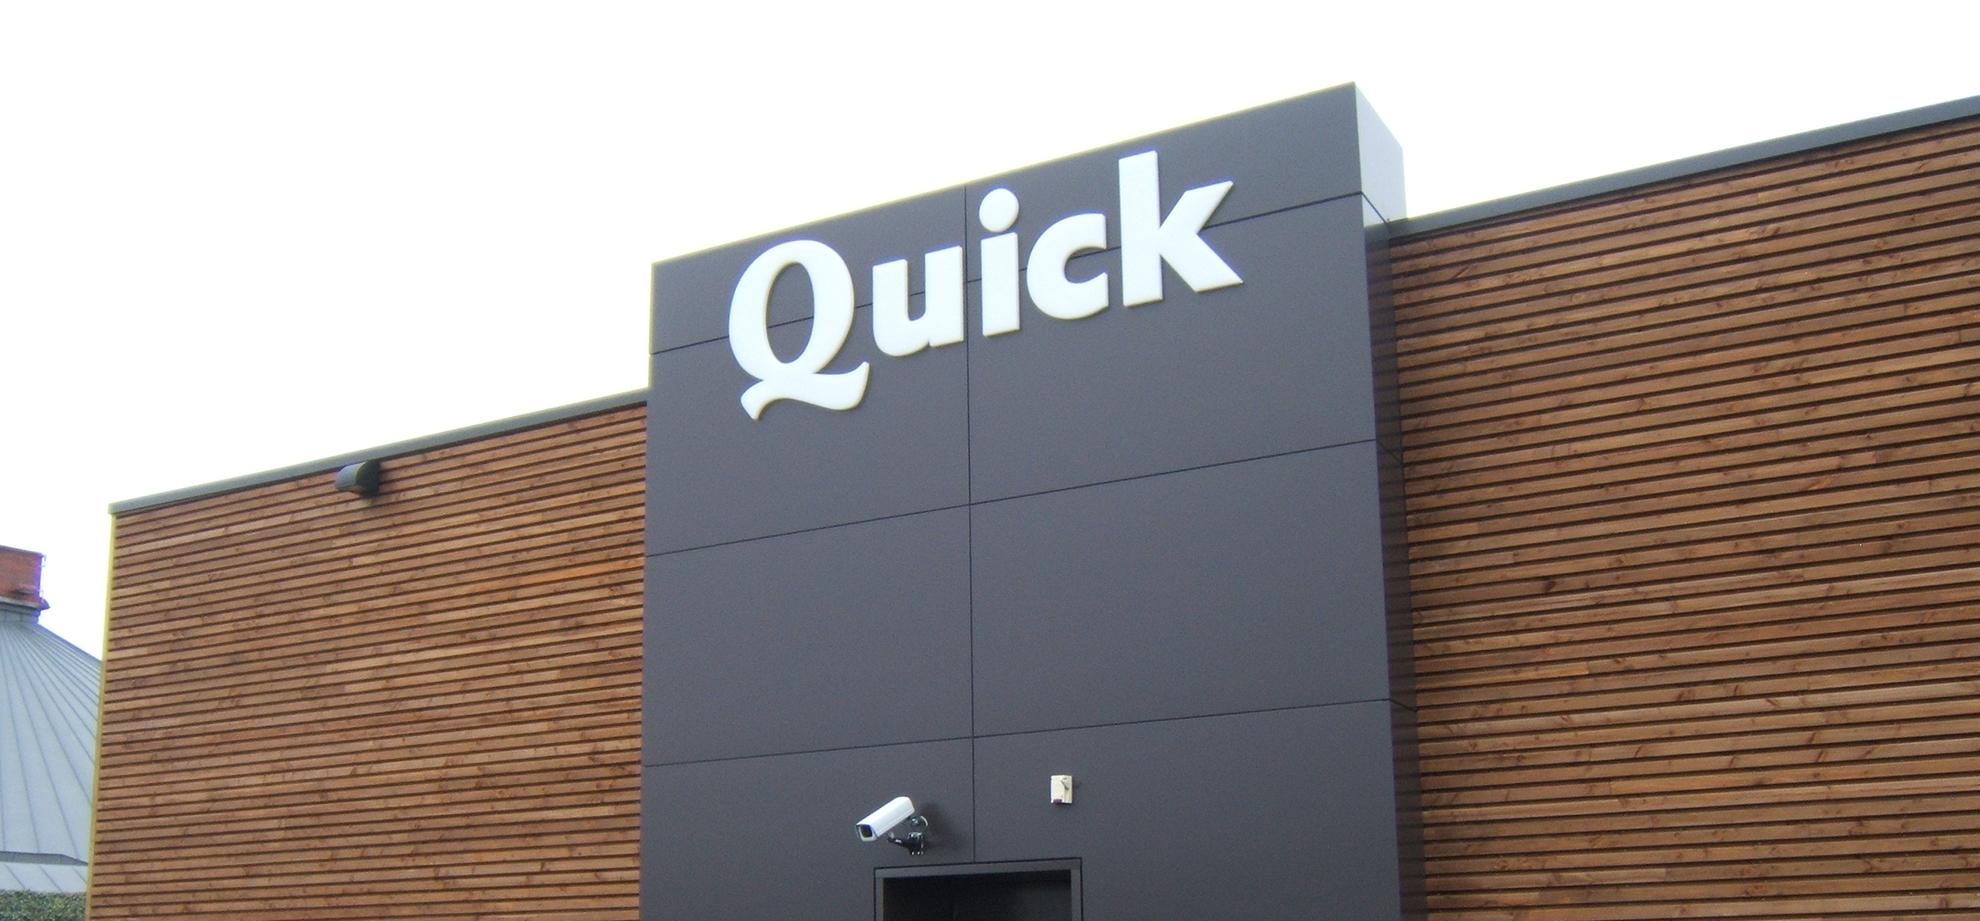 Restaurantes-Quick.-Beurdeos-Francia.-larson-4_1586256268.jpg